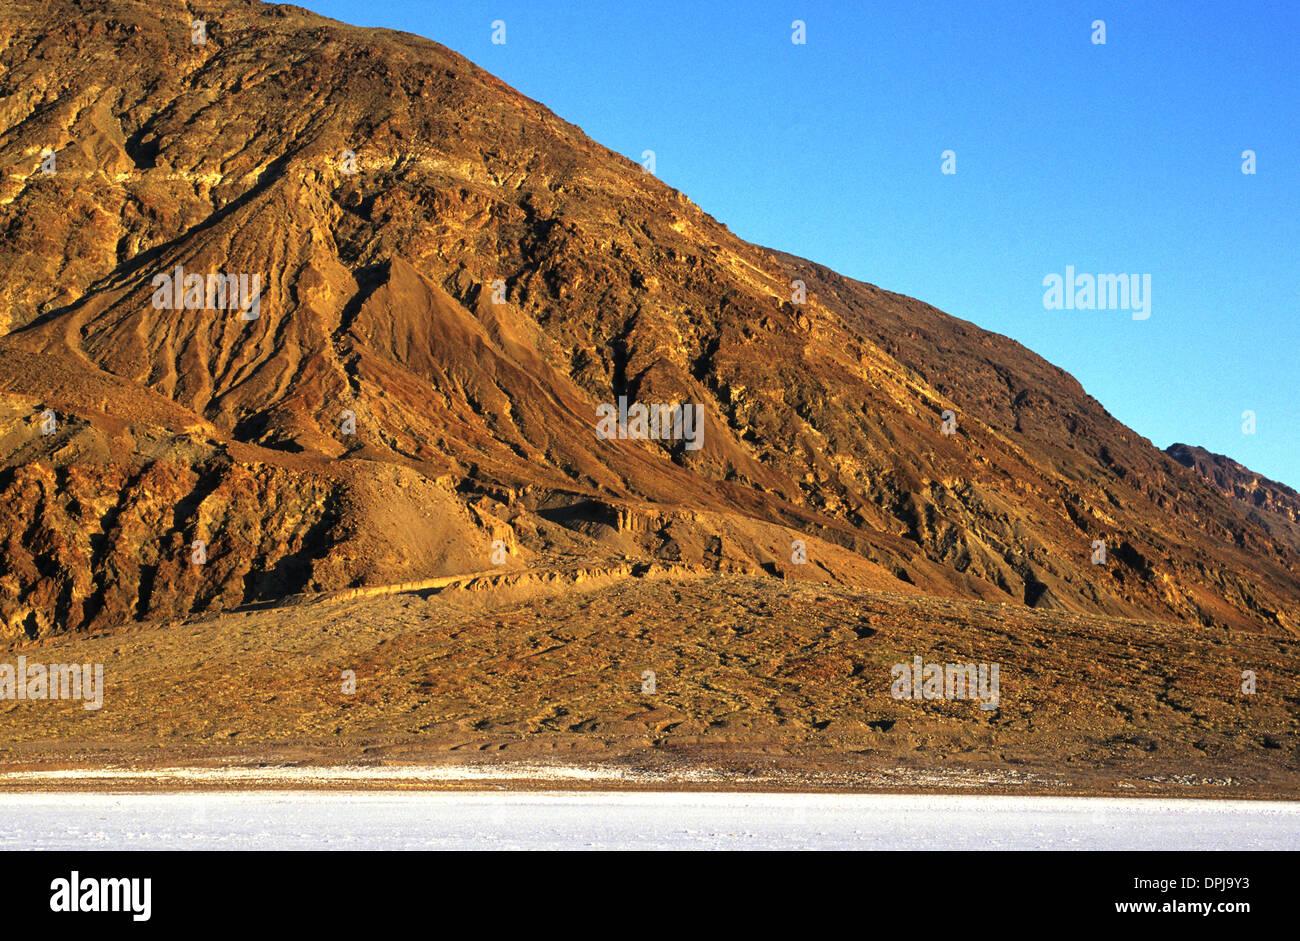 Elk248-1724 California, Death Valley National Park, Shoreline Butte, alluvial fan - Stock Image